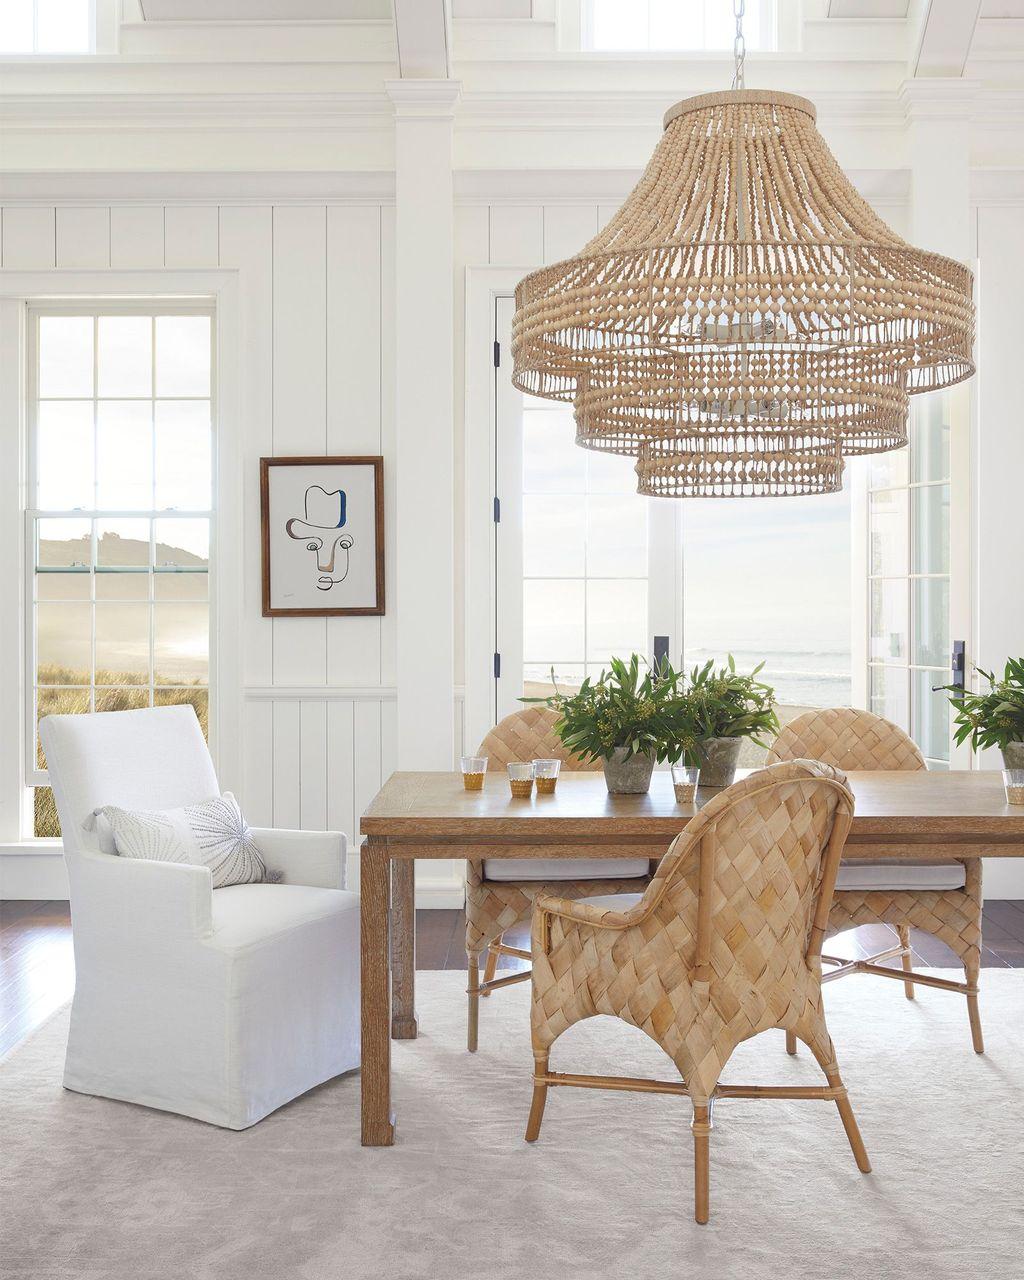 Inspiring Romantic Dining Table Decor Ideas 04